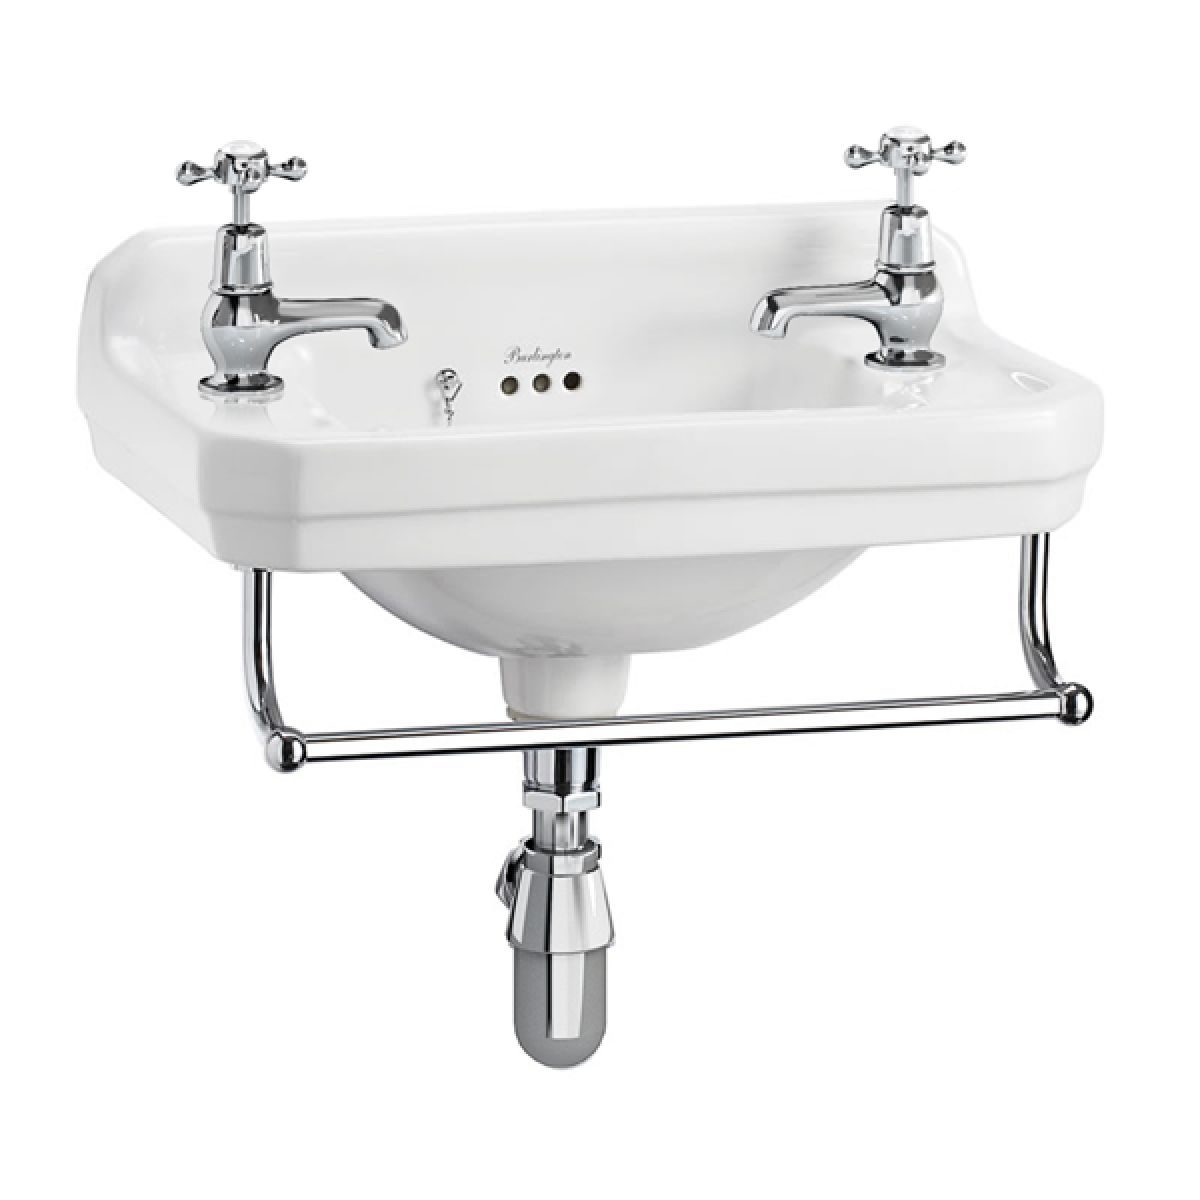 Burlington Edwardian Cloakroom Basin with Optional Towel Rail 510mm